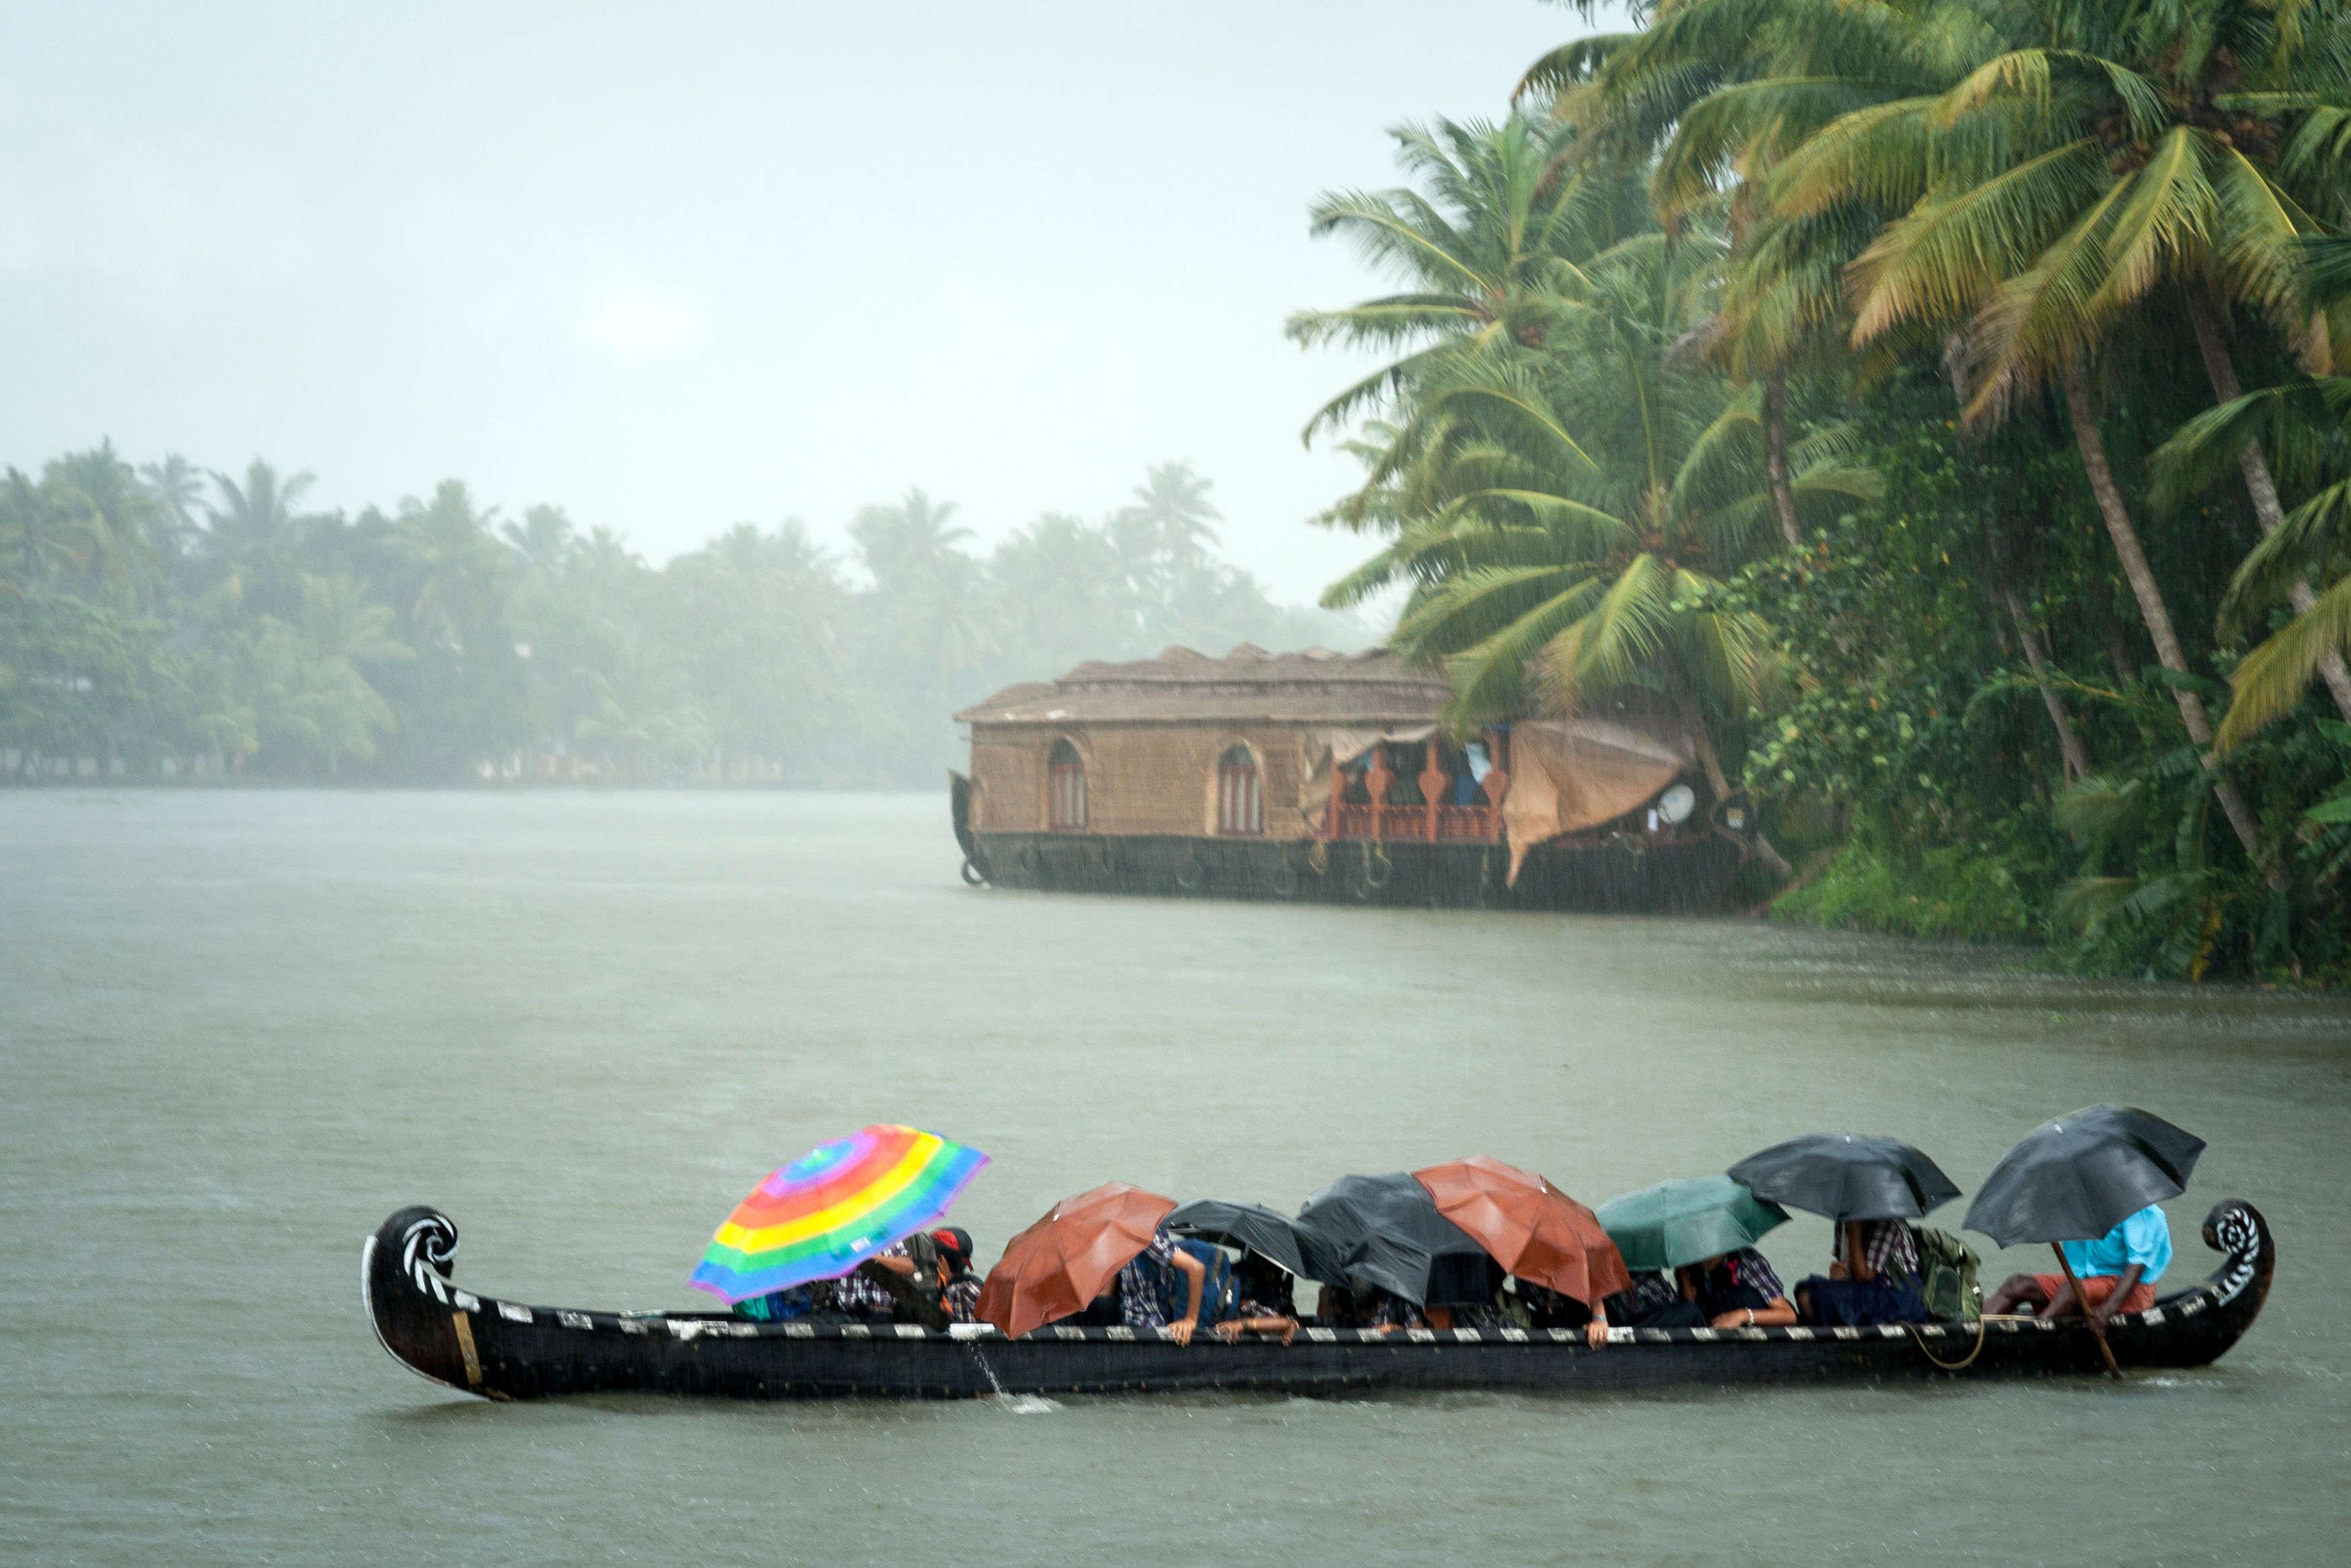 Heavy rain in Kerala: Cochin International Airport stops arrival operations